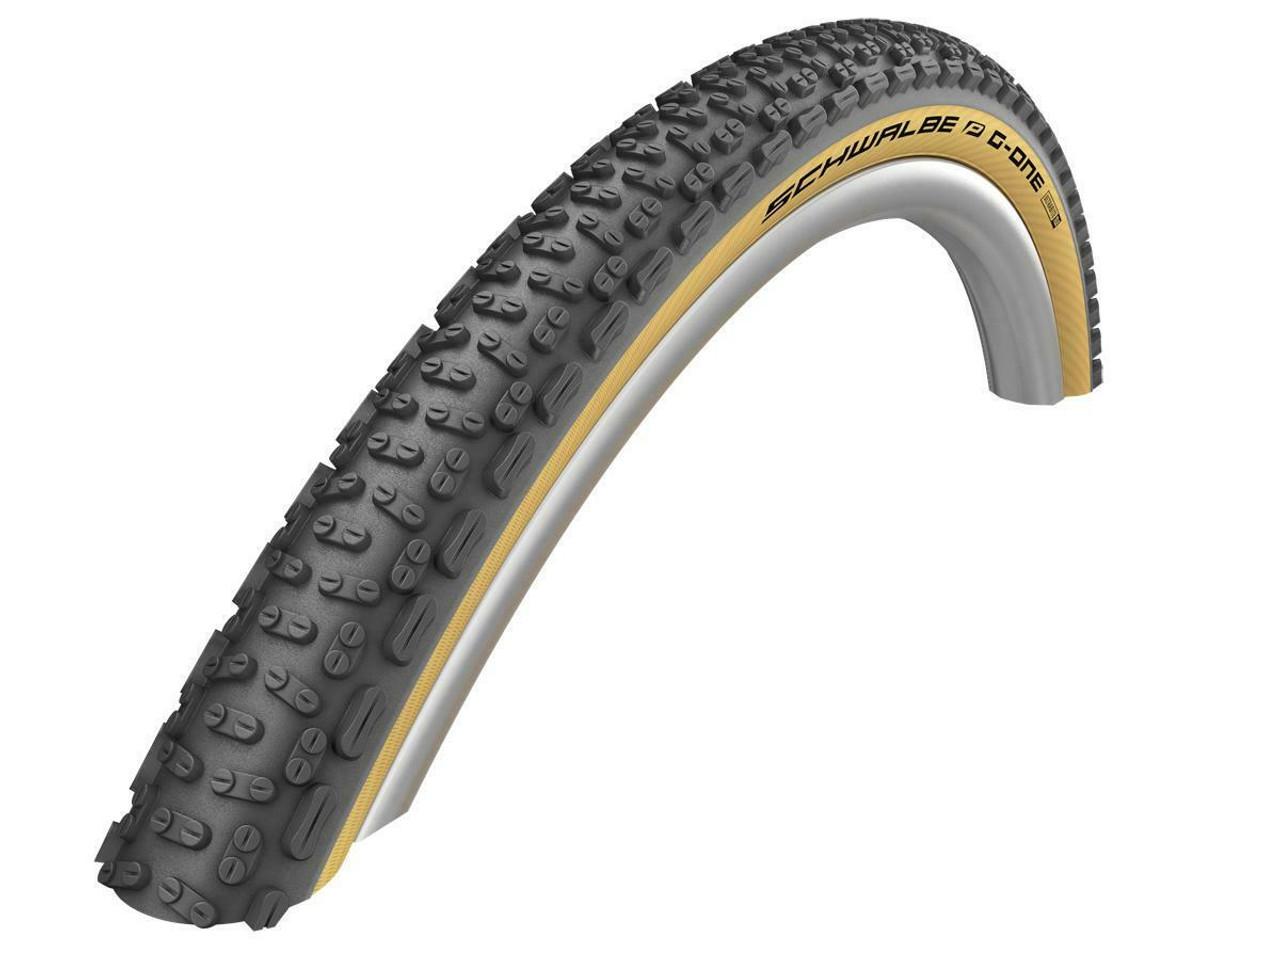 Schwalbe G-One Ultrabite TLE Addix Performance RaceGuard Gravel Tyre in Classic Skin